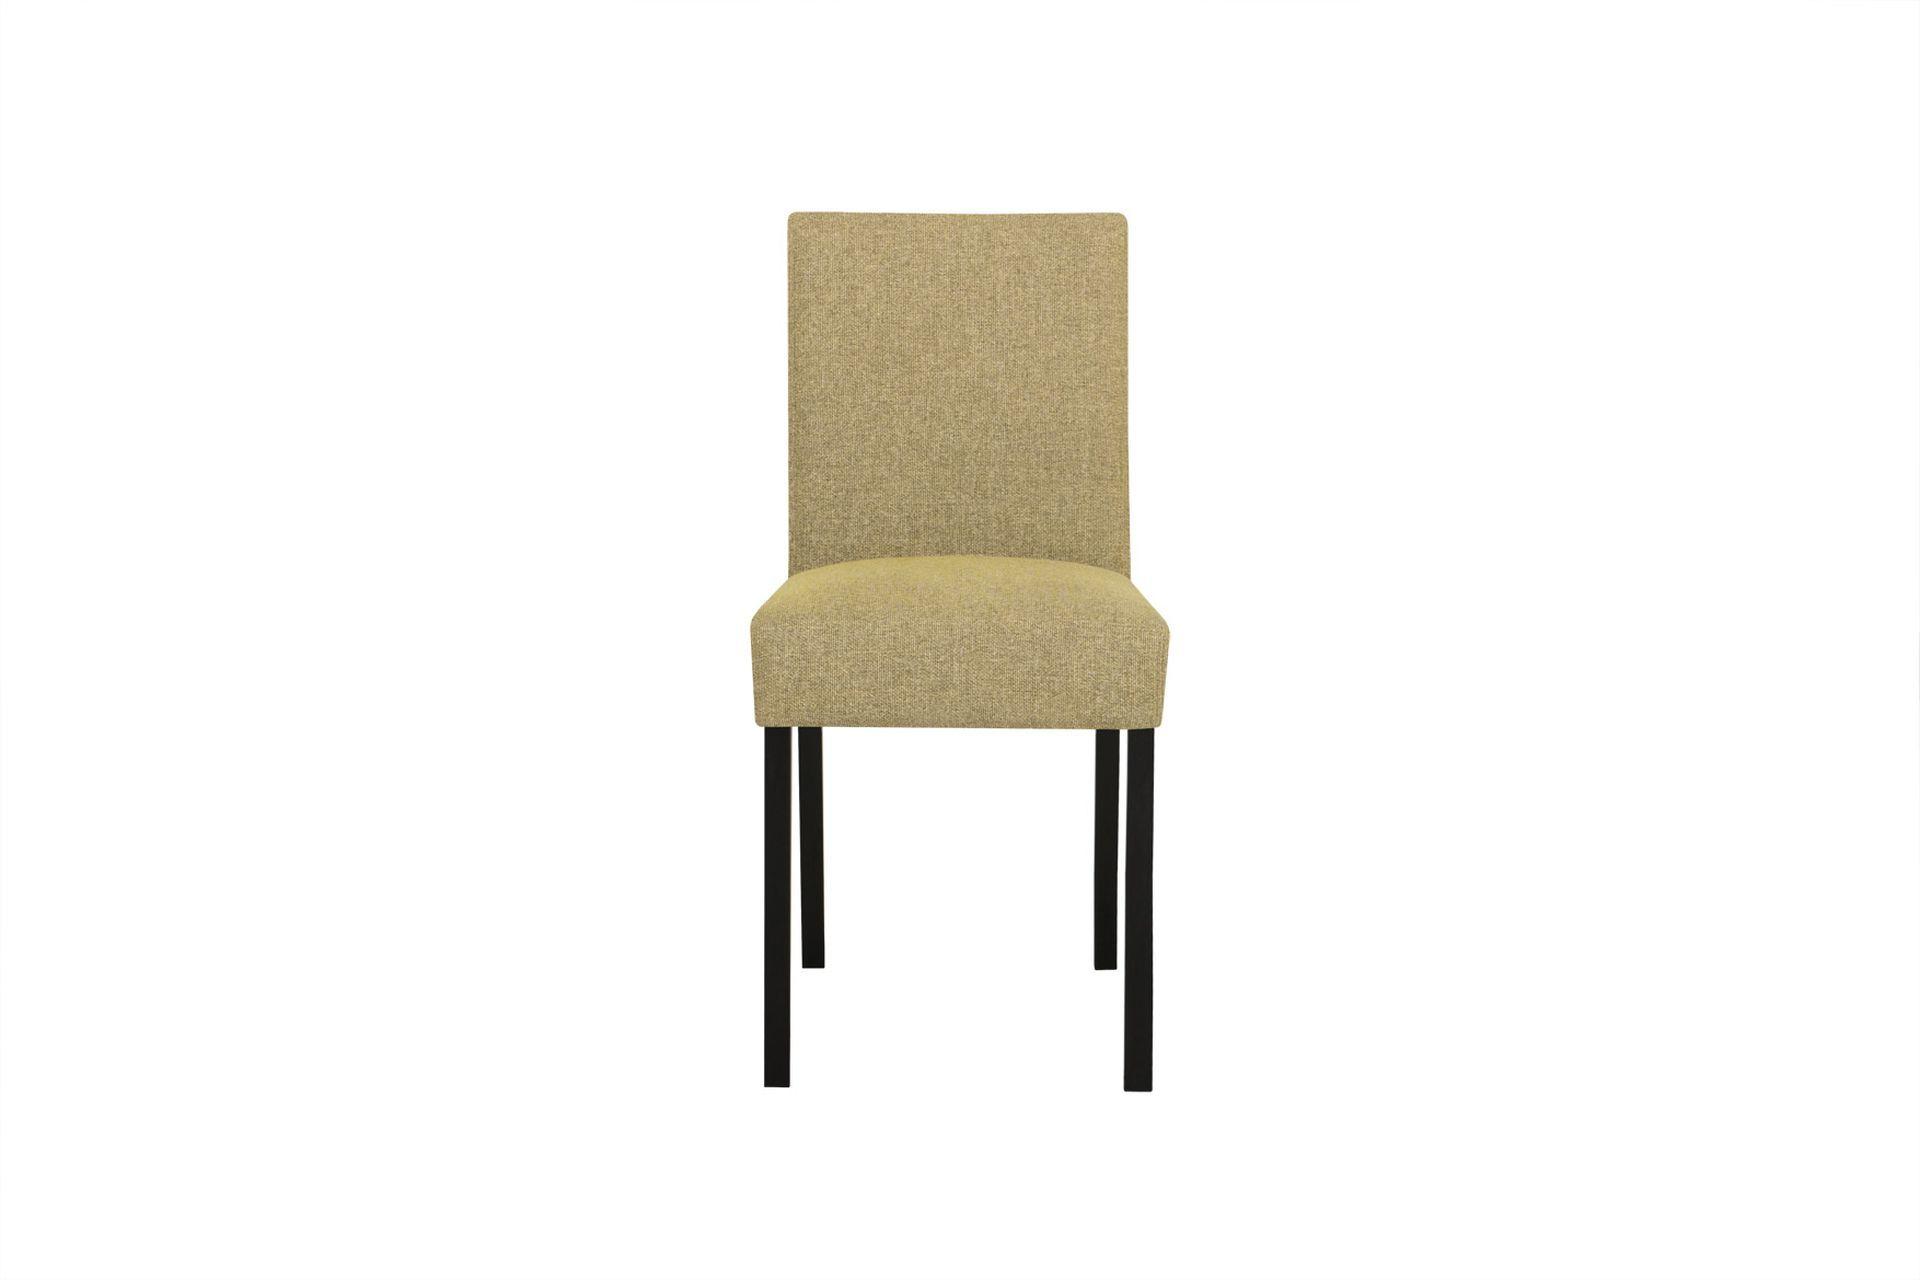 Кухонный стул Sits 15447049 от thefurnish